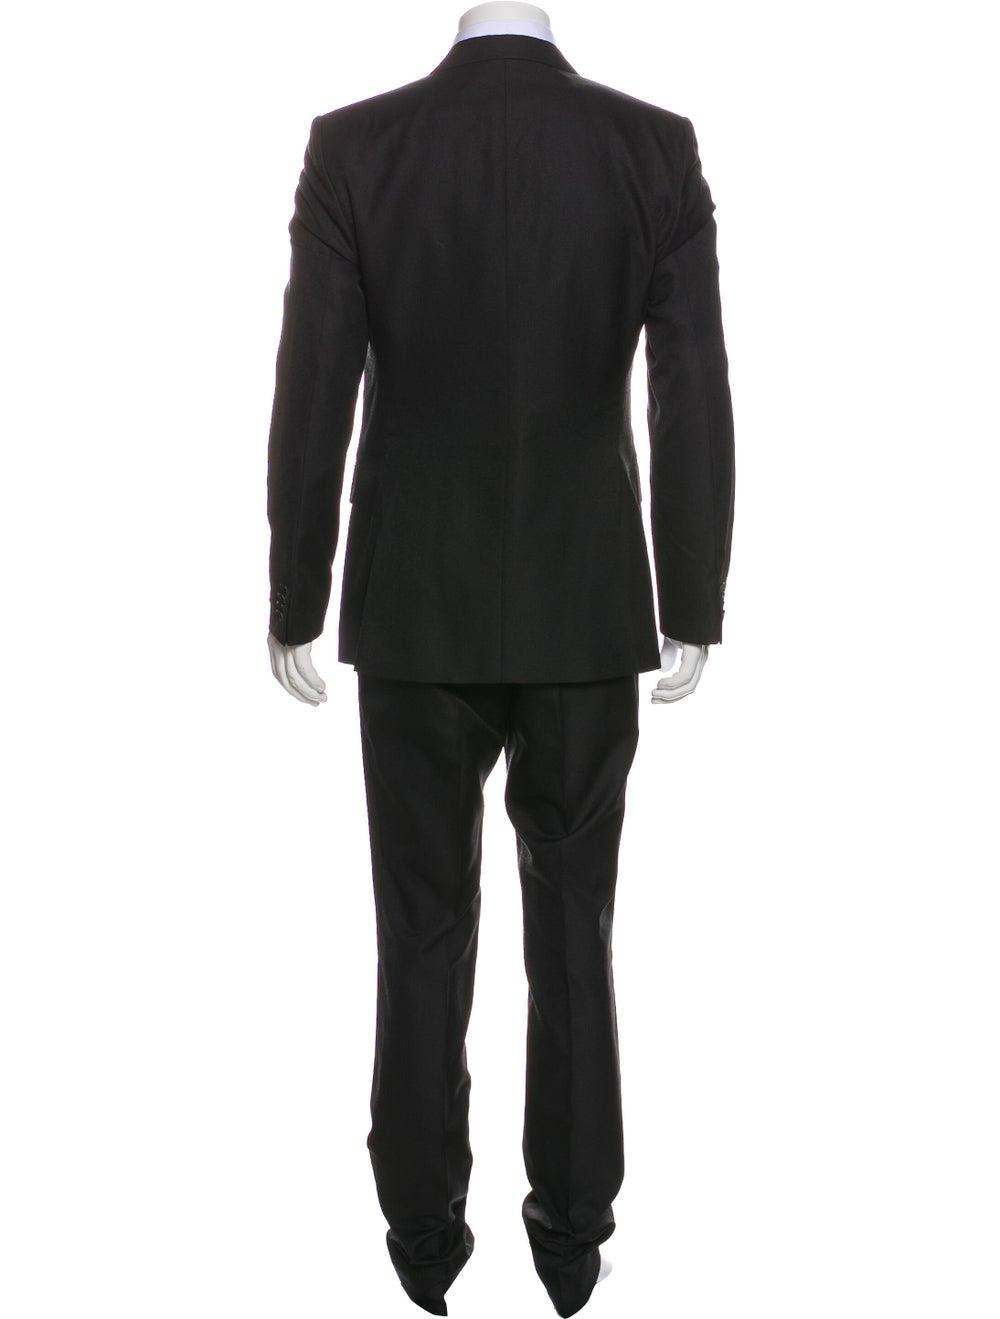 Tiger of Sweden Two-Piece Suit Black - image 3